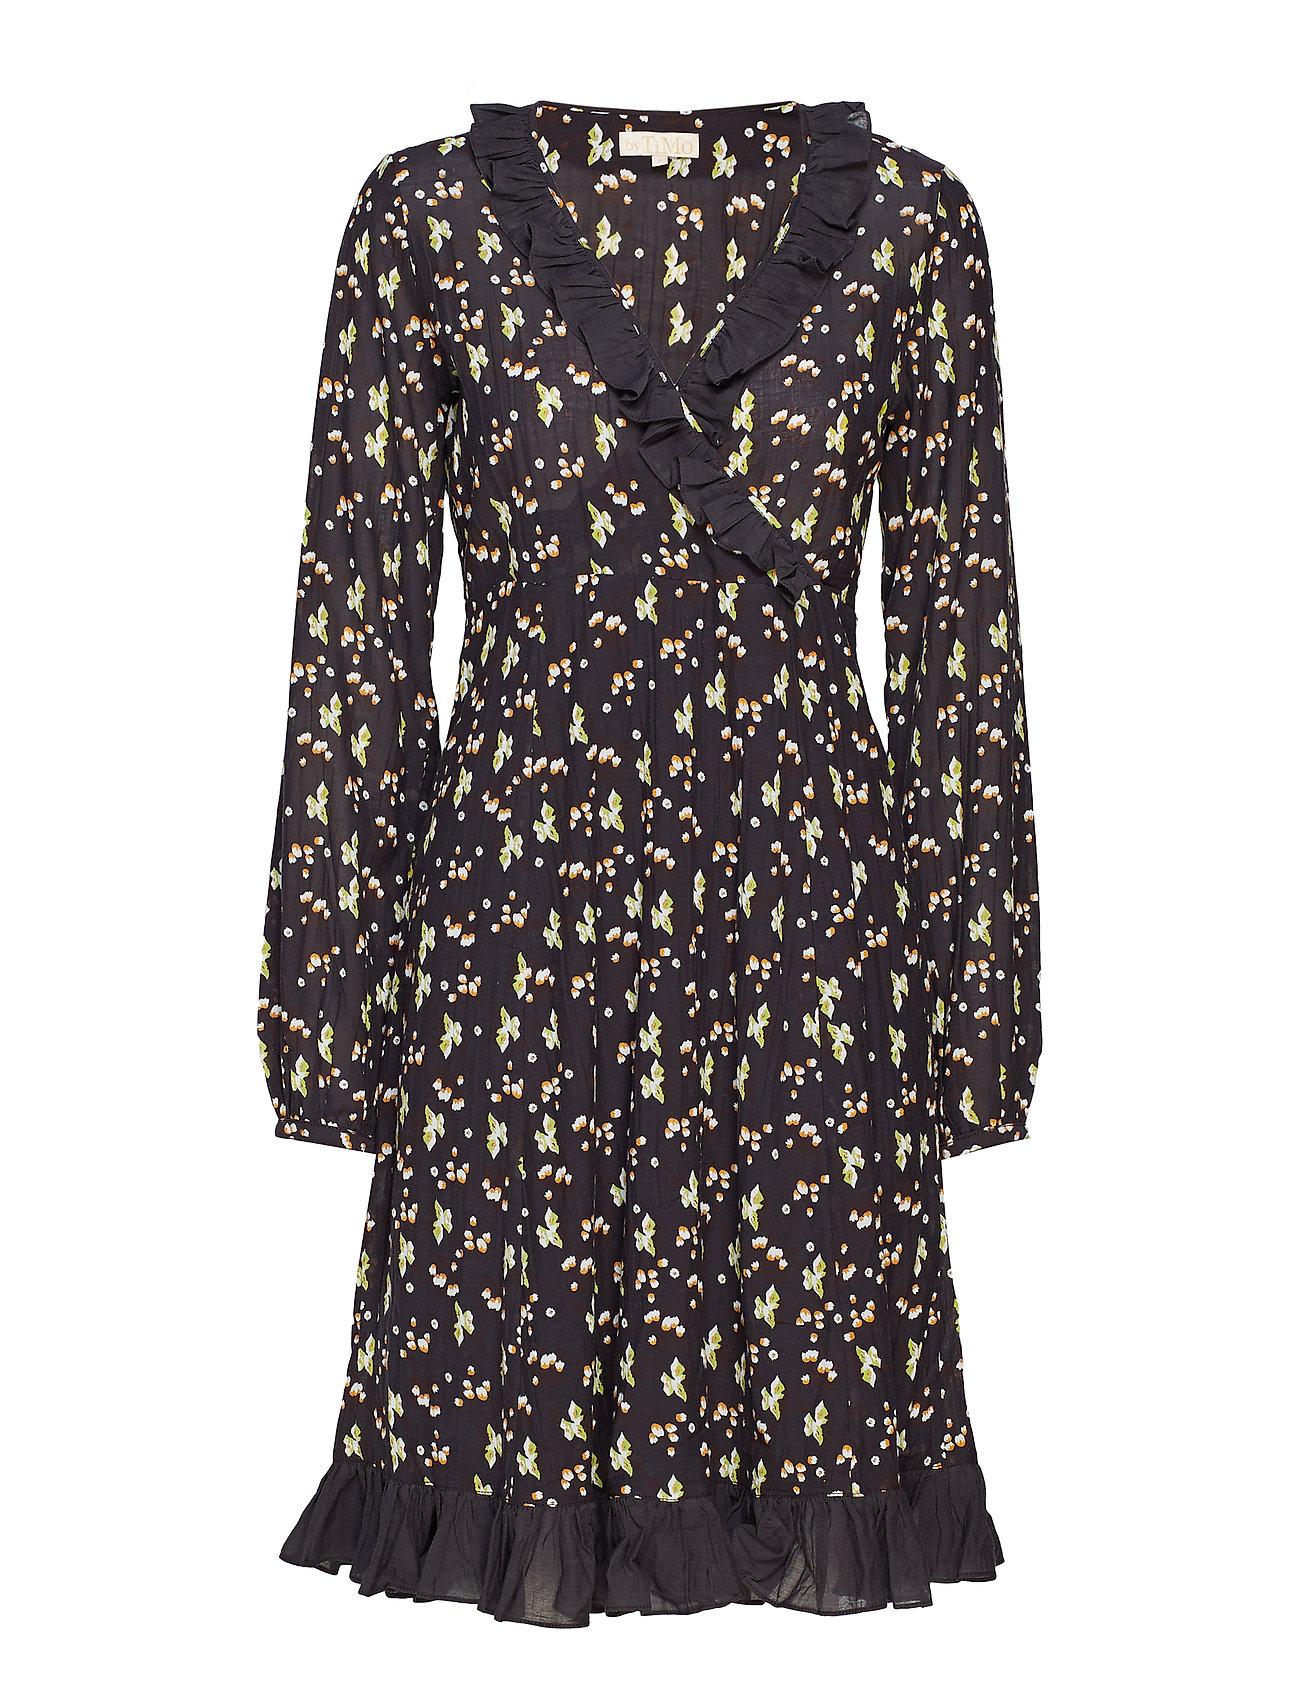 Image of Bohemian Wrap Dress Knælang Kjole Sort By Ti Mo (3406164643)